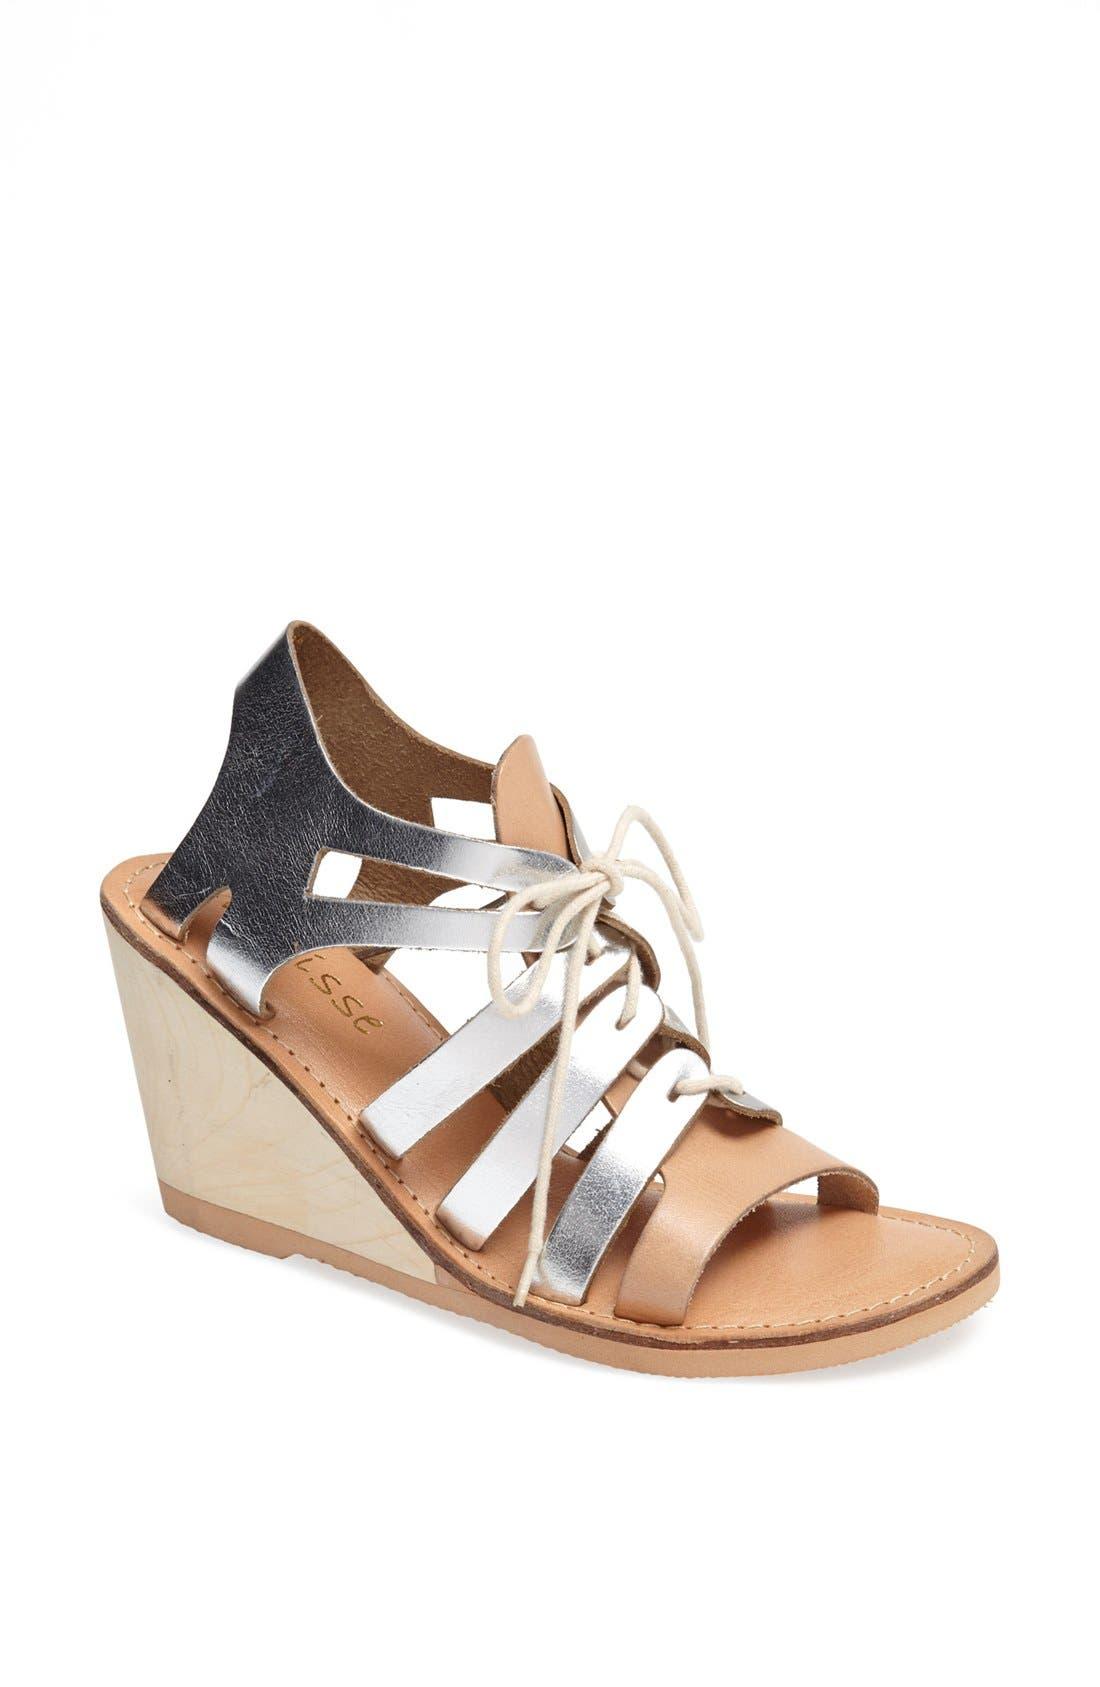 Main Image - Matisse 'Begin' Metallic Leather Wedge Sandal